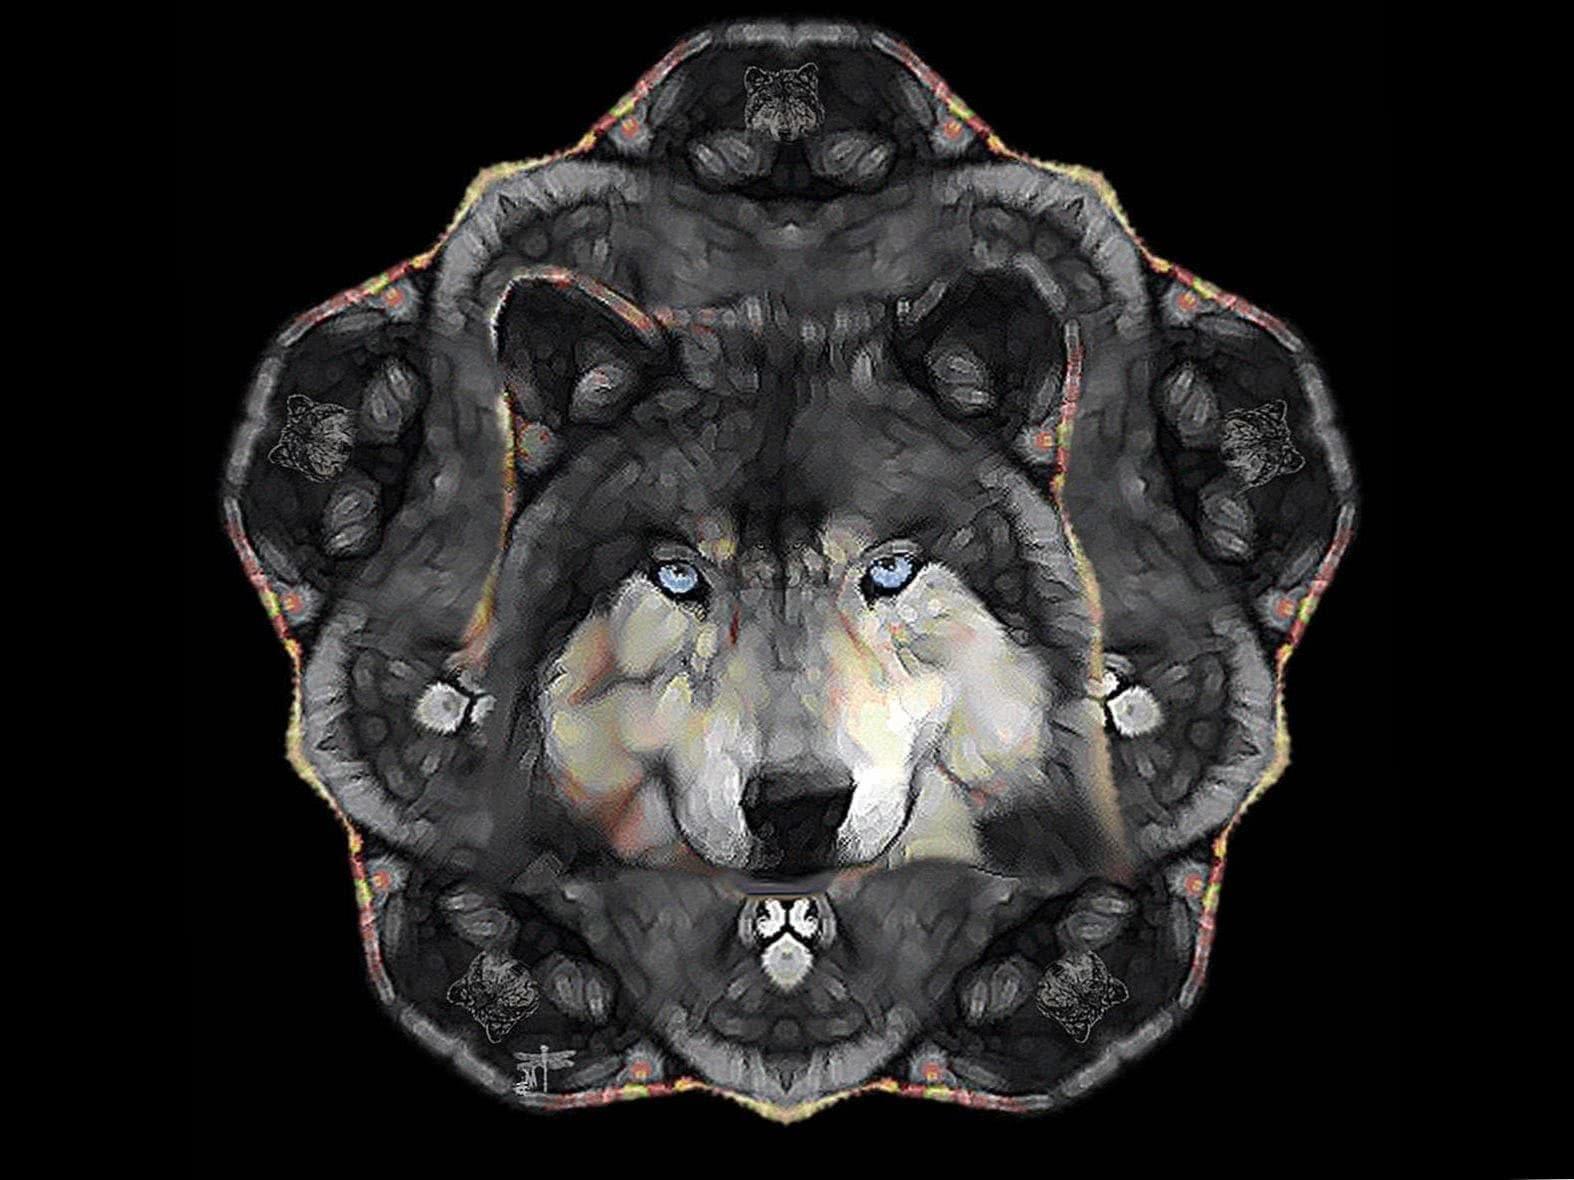 Wolf Windows 8 Wallpaper